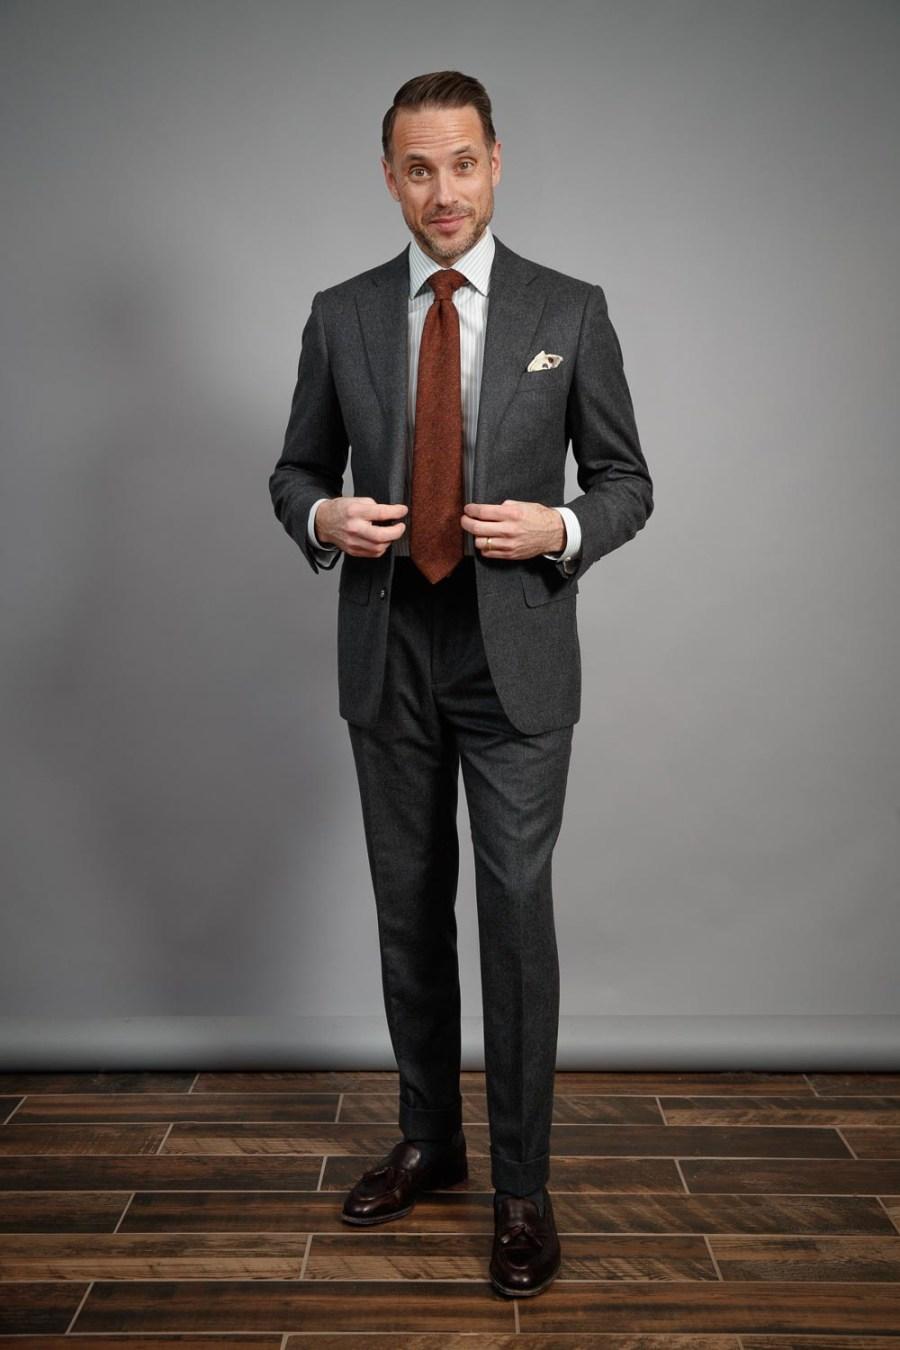 five-ways-to-wear-grey-flannel-suit-for-men-rust-tie-white-shirt-tassel-loafers-2021